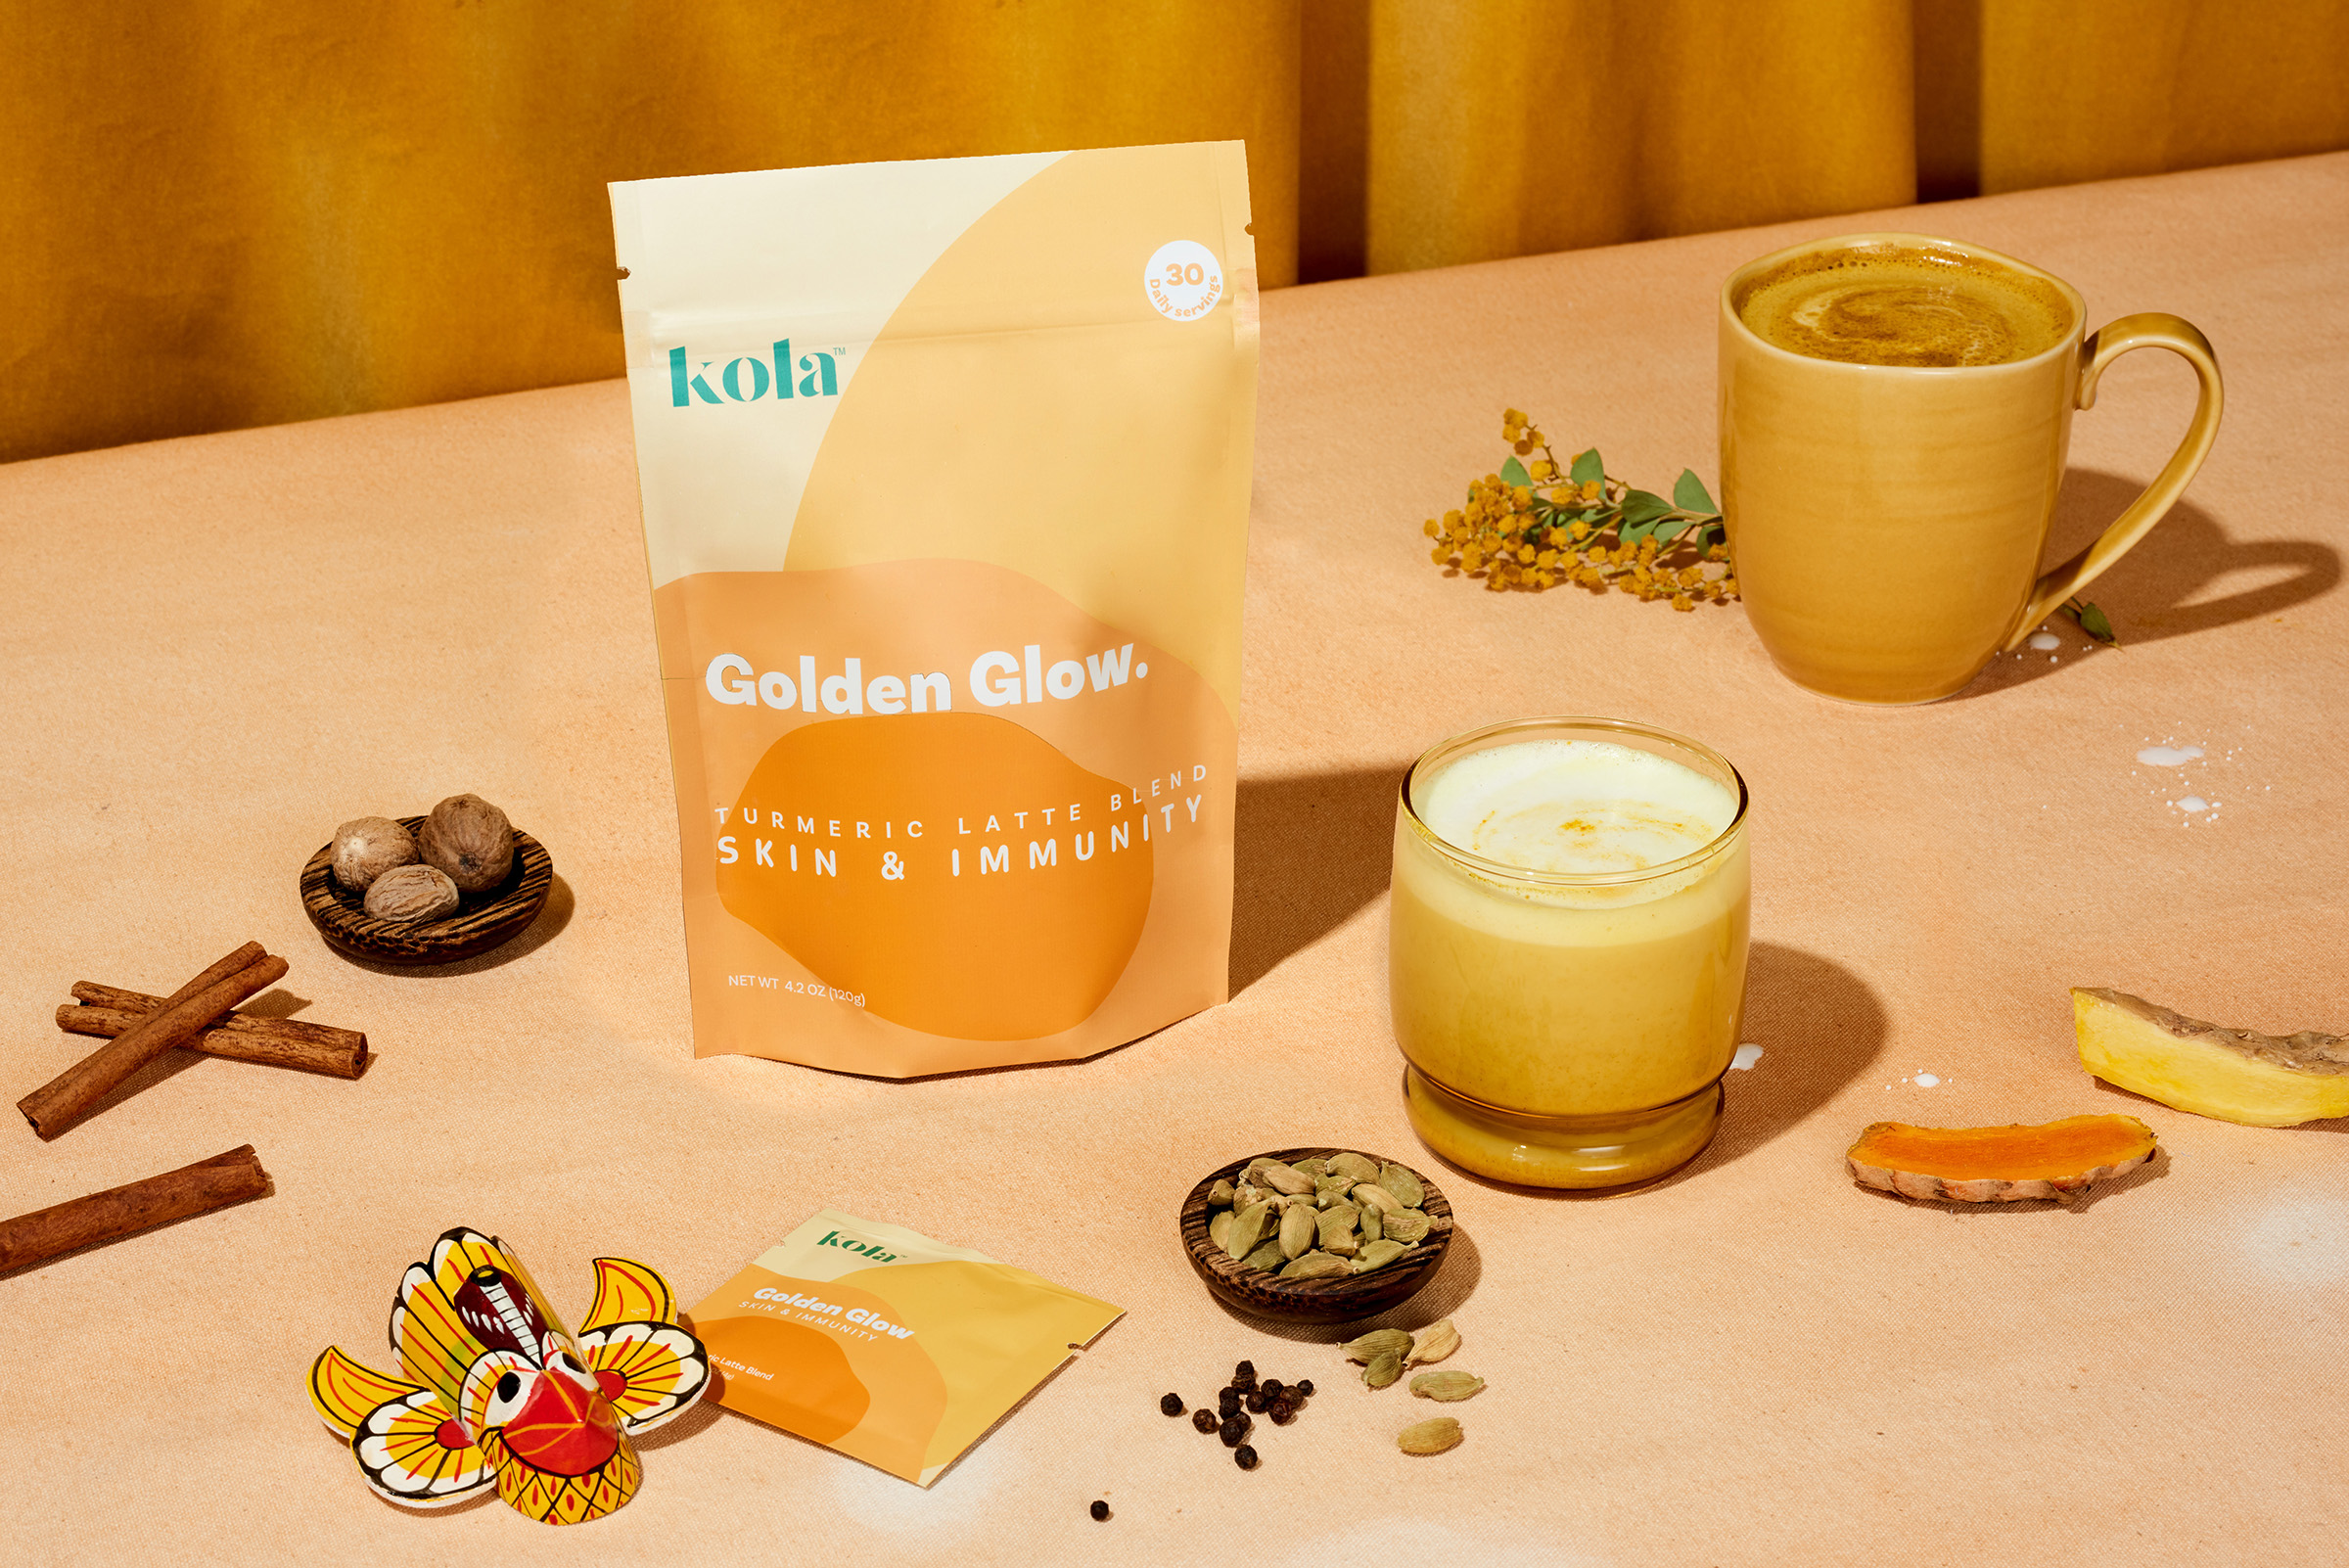 Kola — Golden Glow SUP webs